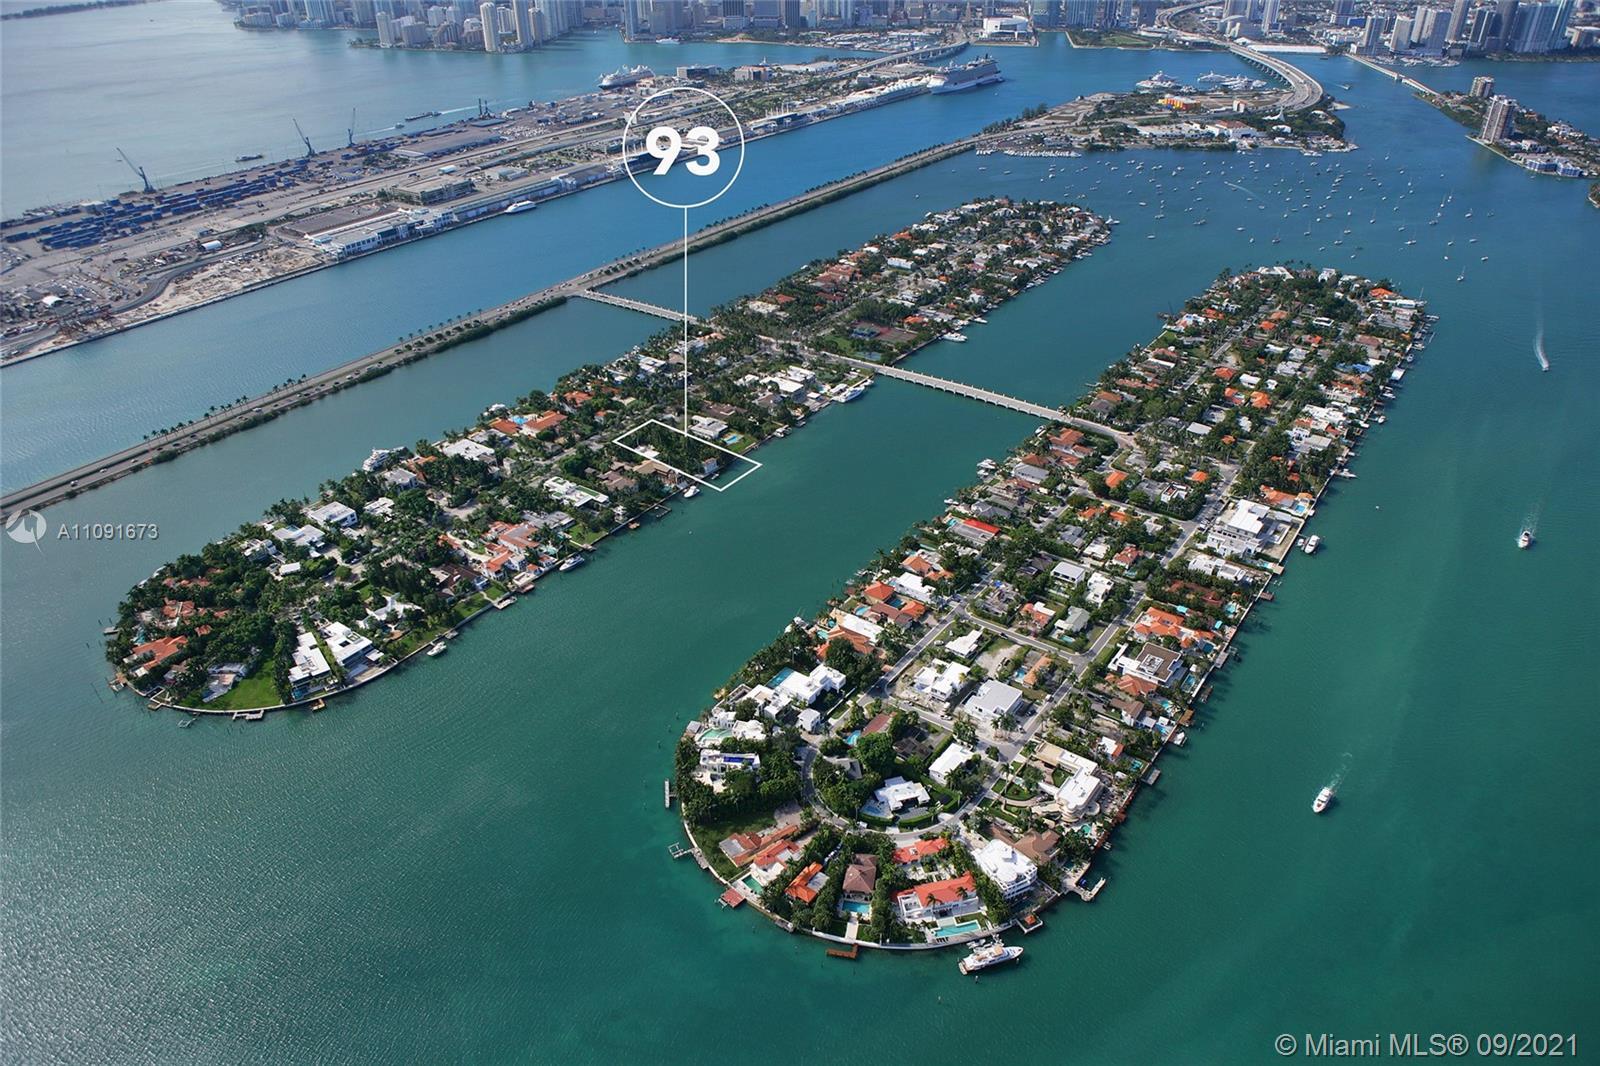 93 Palm Ave, Miami Beach, Florida 33139